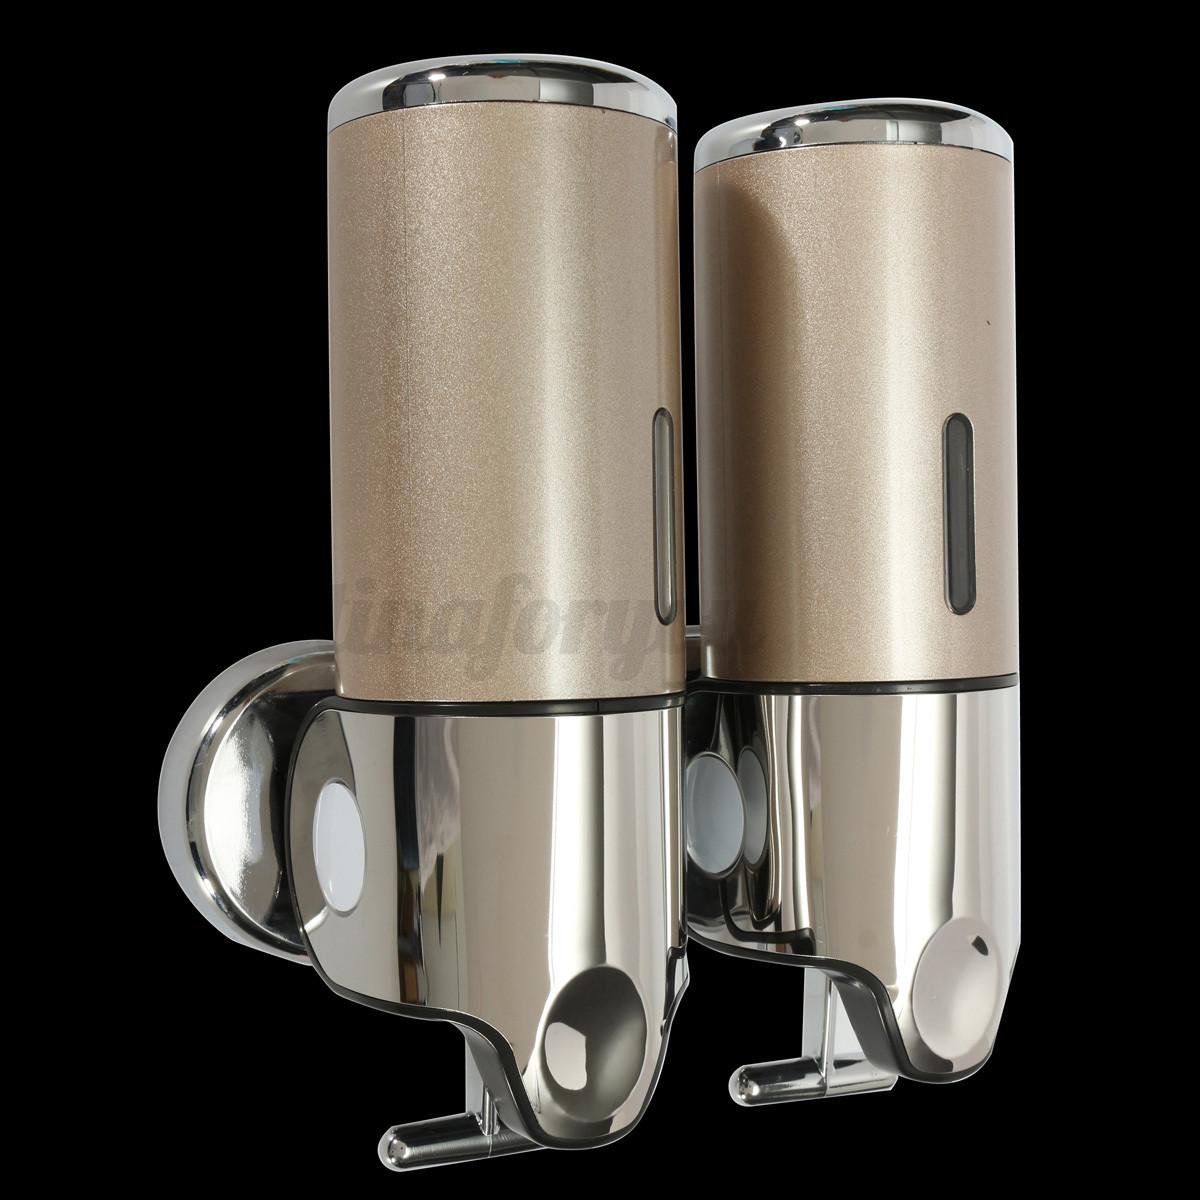 Wall Mounted Bathroom Soap Dispenser  3 Bottles Wall Mounted Hotel Bathroom Soap Dispenser 500ML